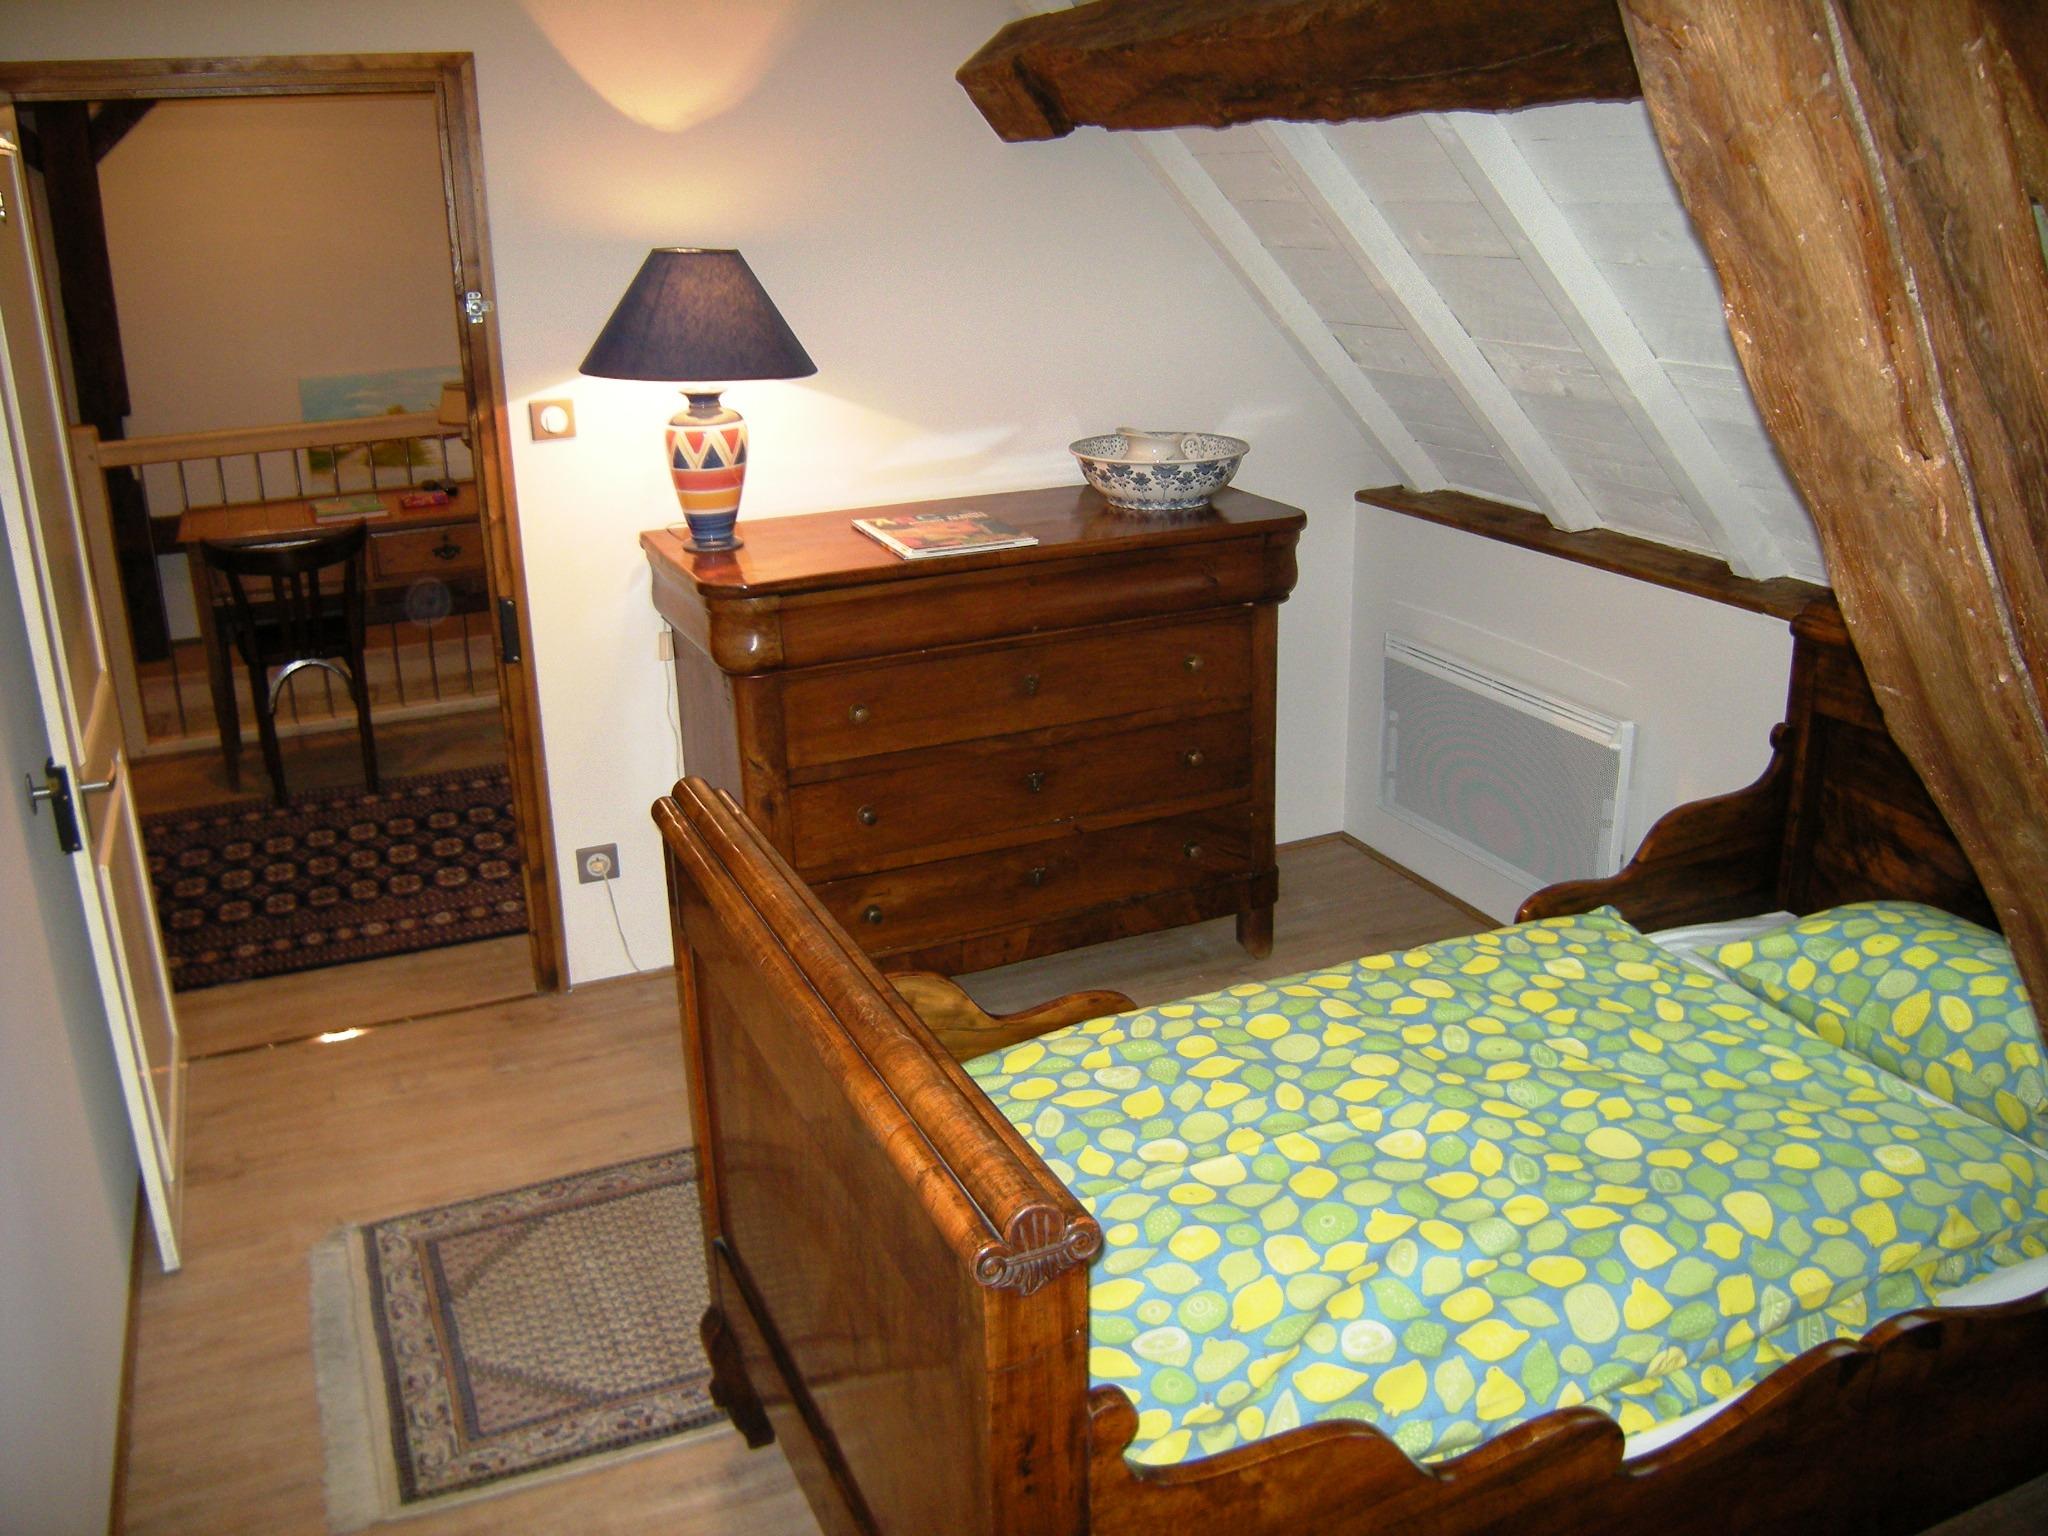 ferienhaus f r 8 personen. Black Bedroom Furniture Sets. Home Design Ideas